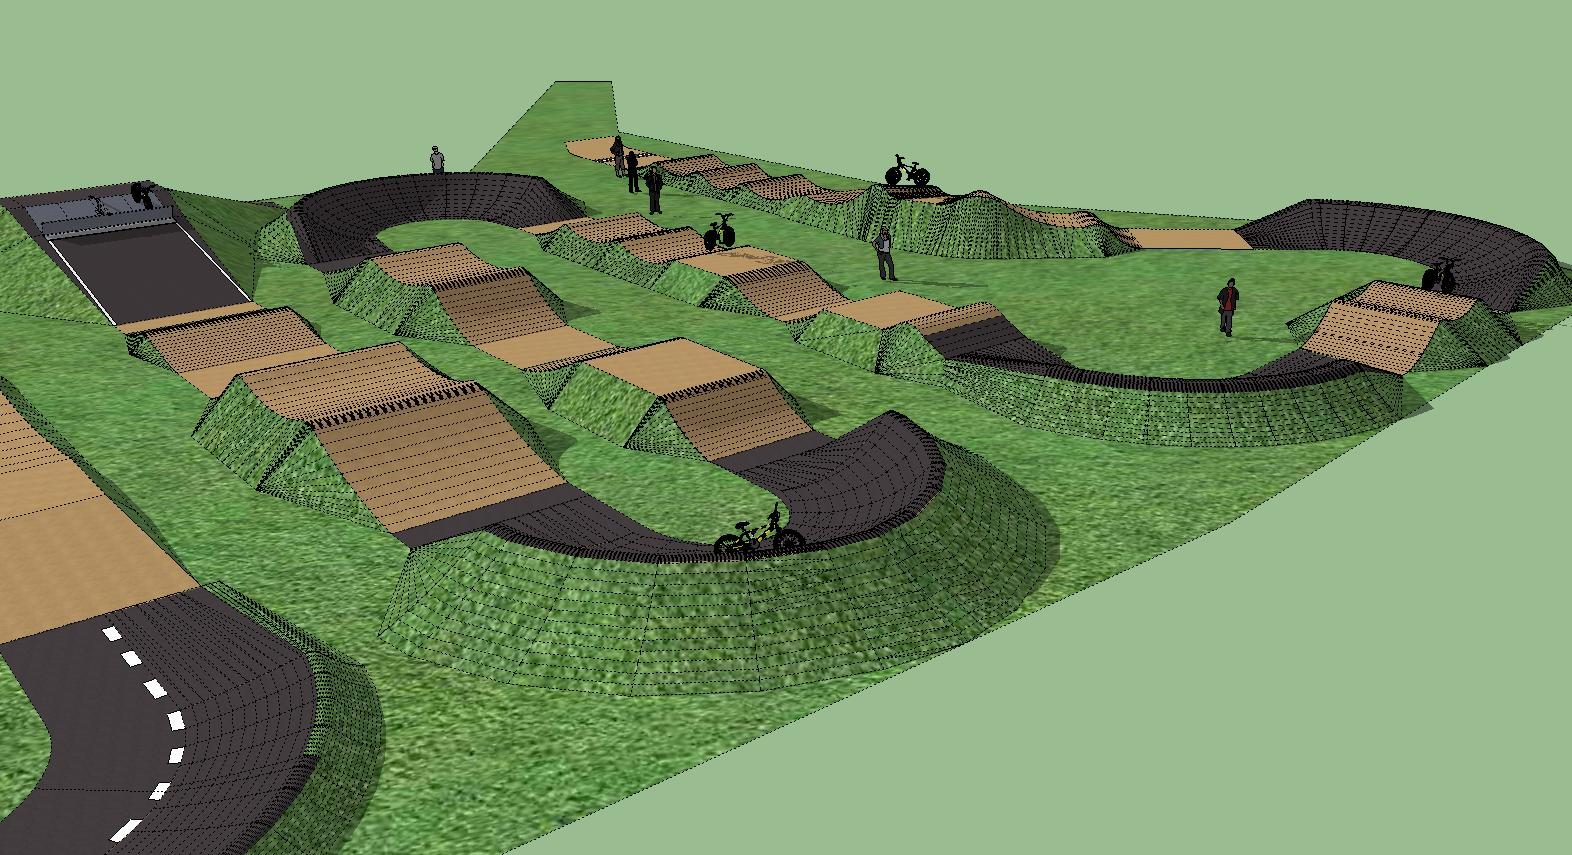 Dirt Track Design Software